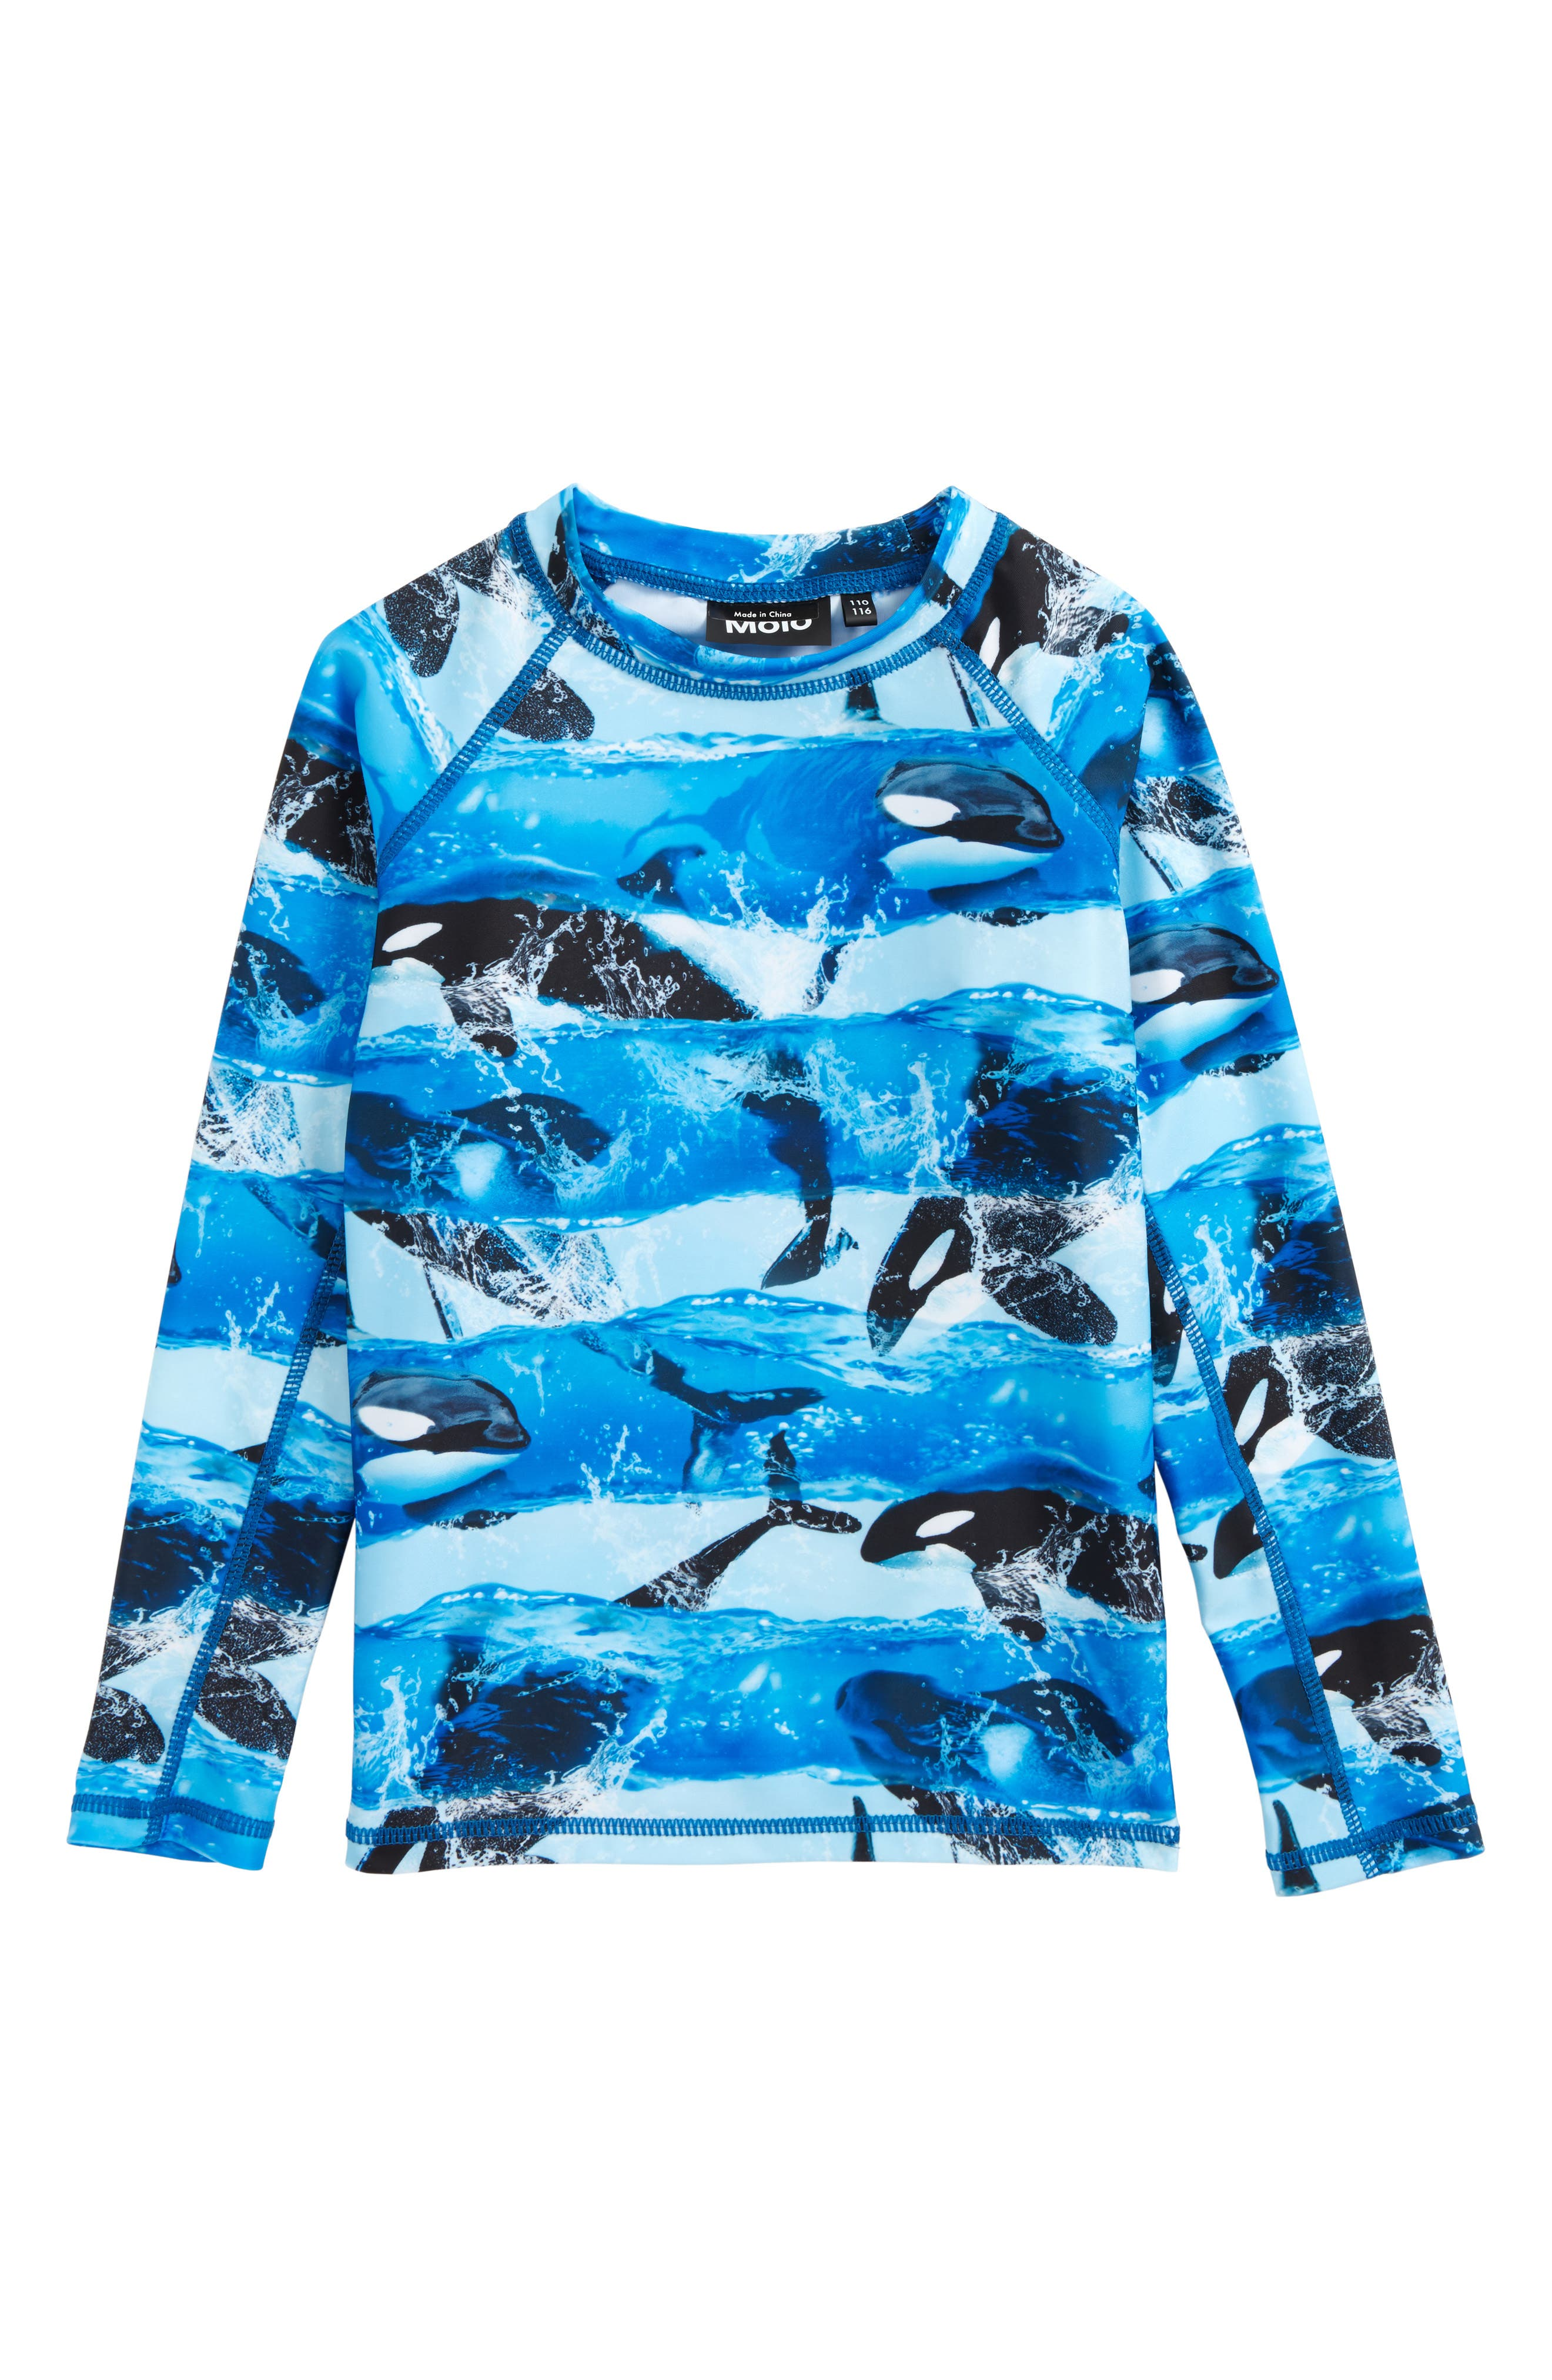 Neptune Long Sleeve Rashguard,                         Main,                         color, Killer Whale